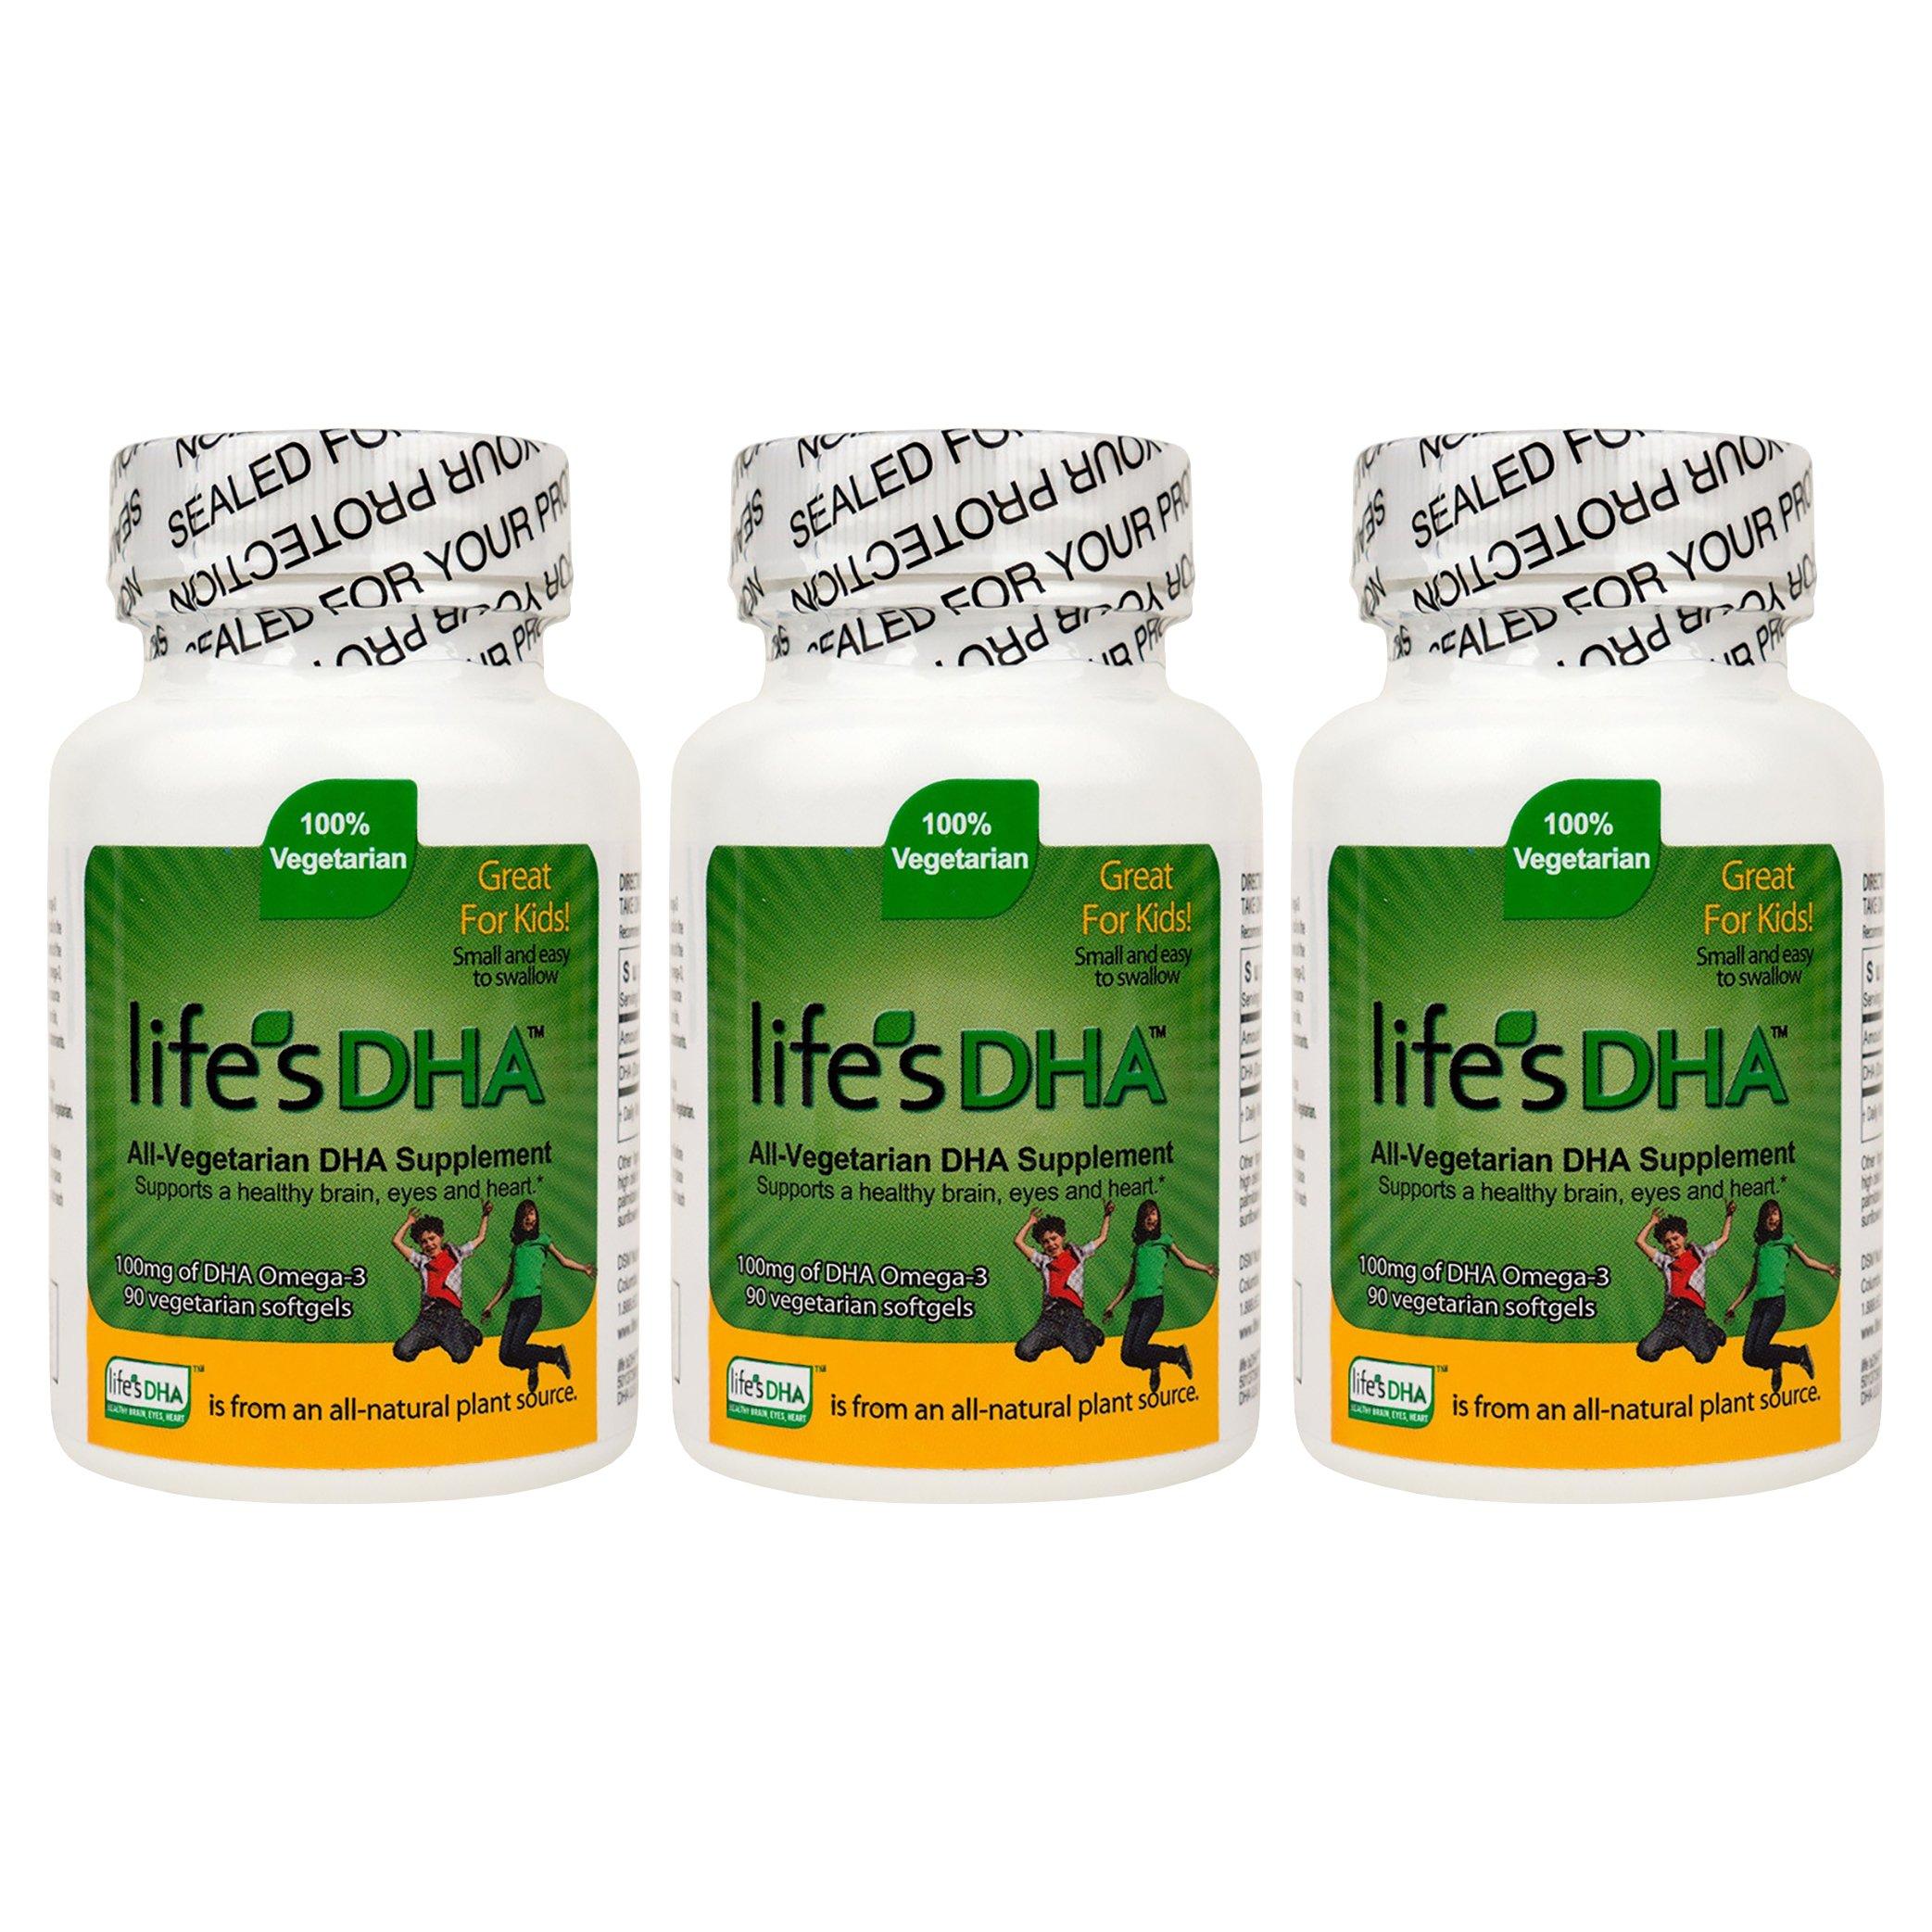 Martek Life's DHA Omega-3 DHA 100mg 90 All-vegetarian Softgels Kids - 3 Count